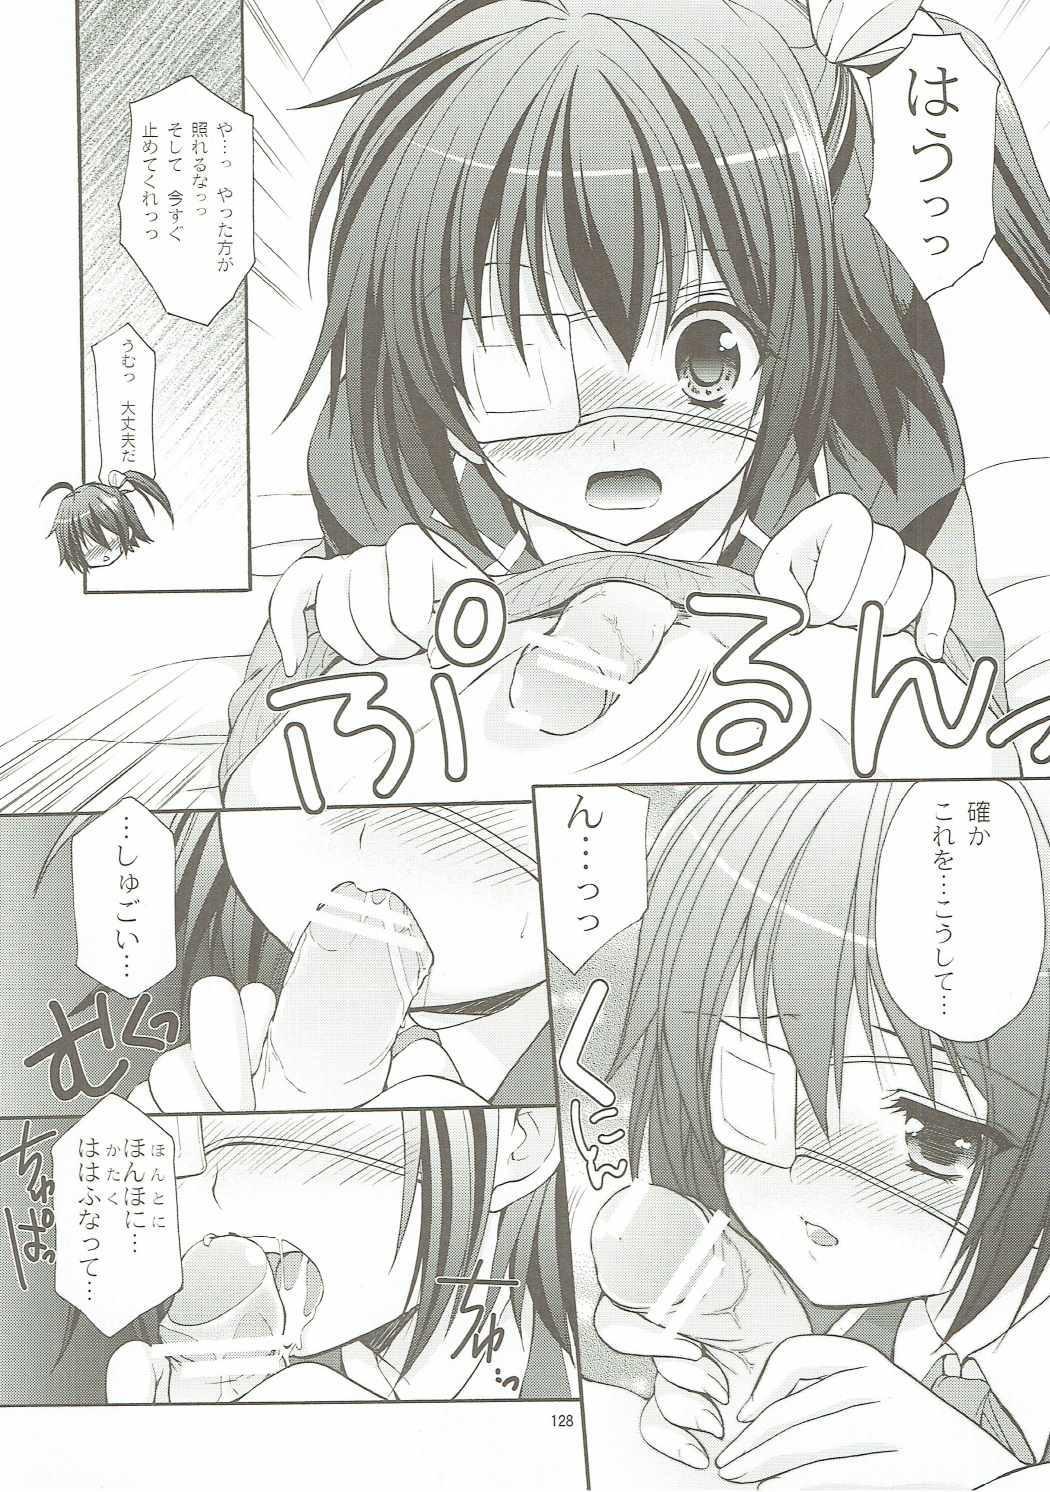 ANIME COLLECTION Imomuya Honpo - Singleton Anime Soushuuhen 126